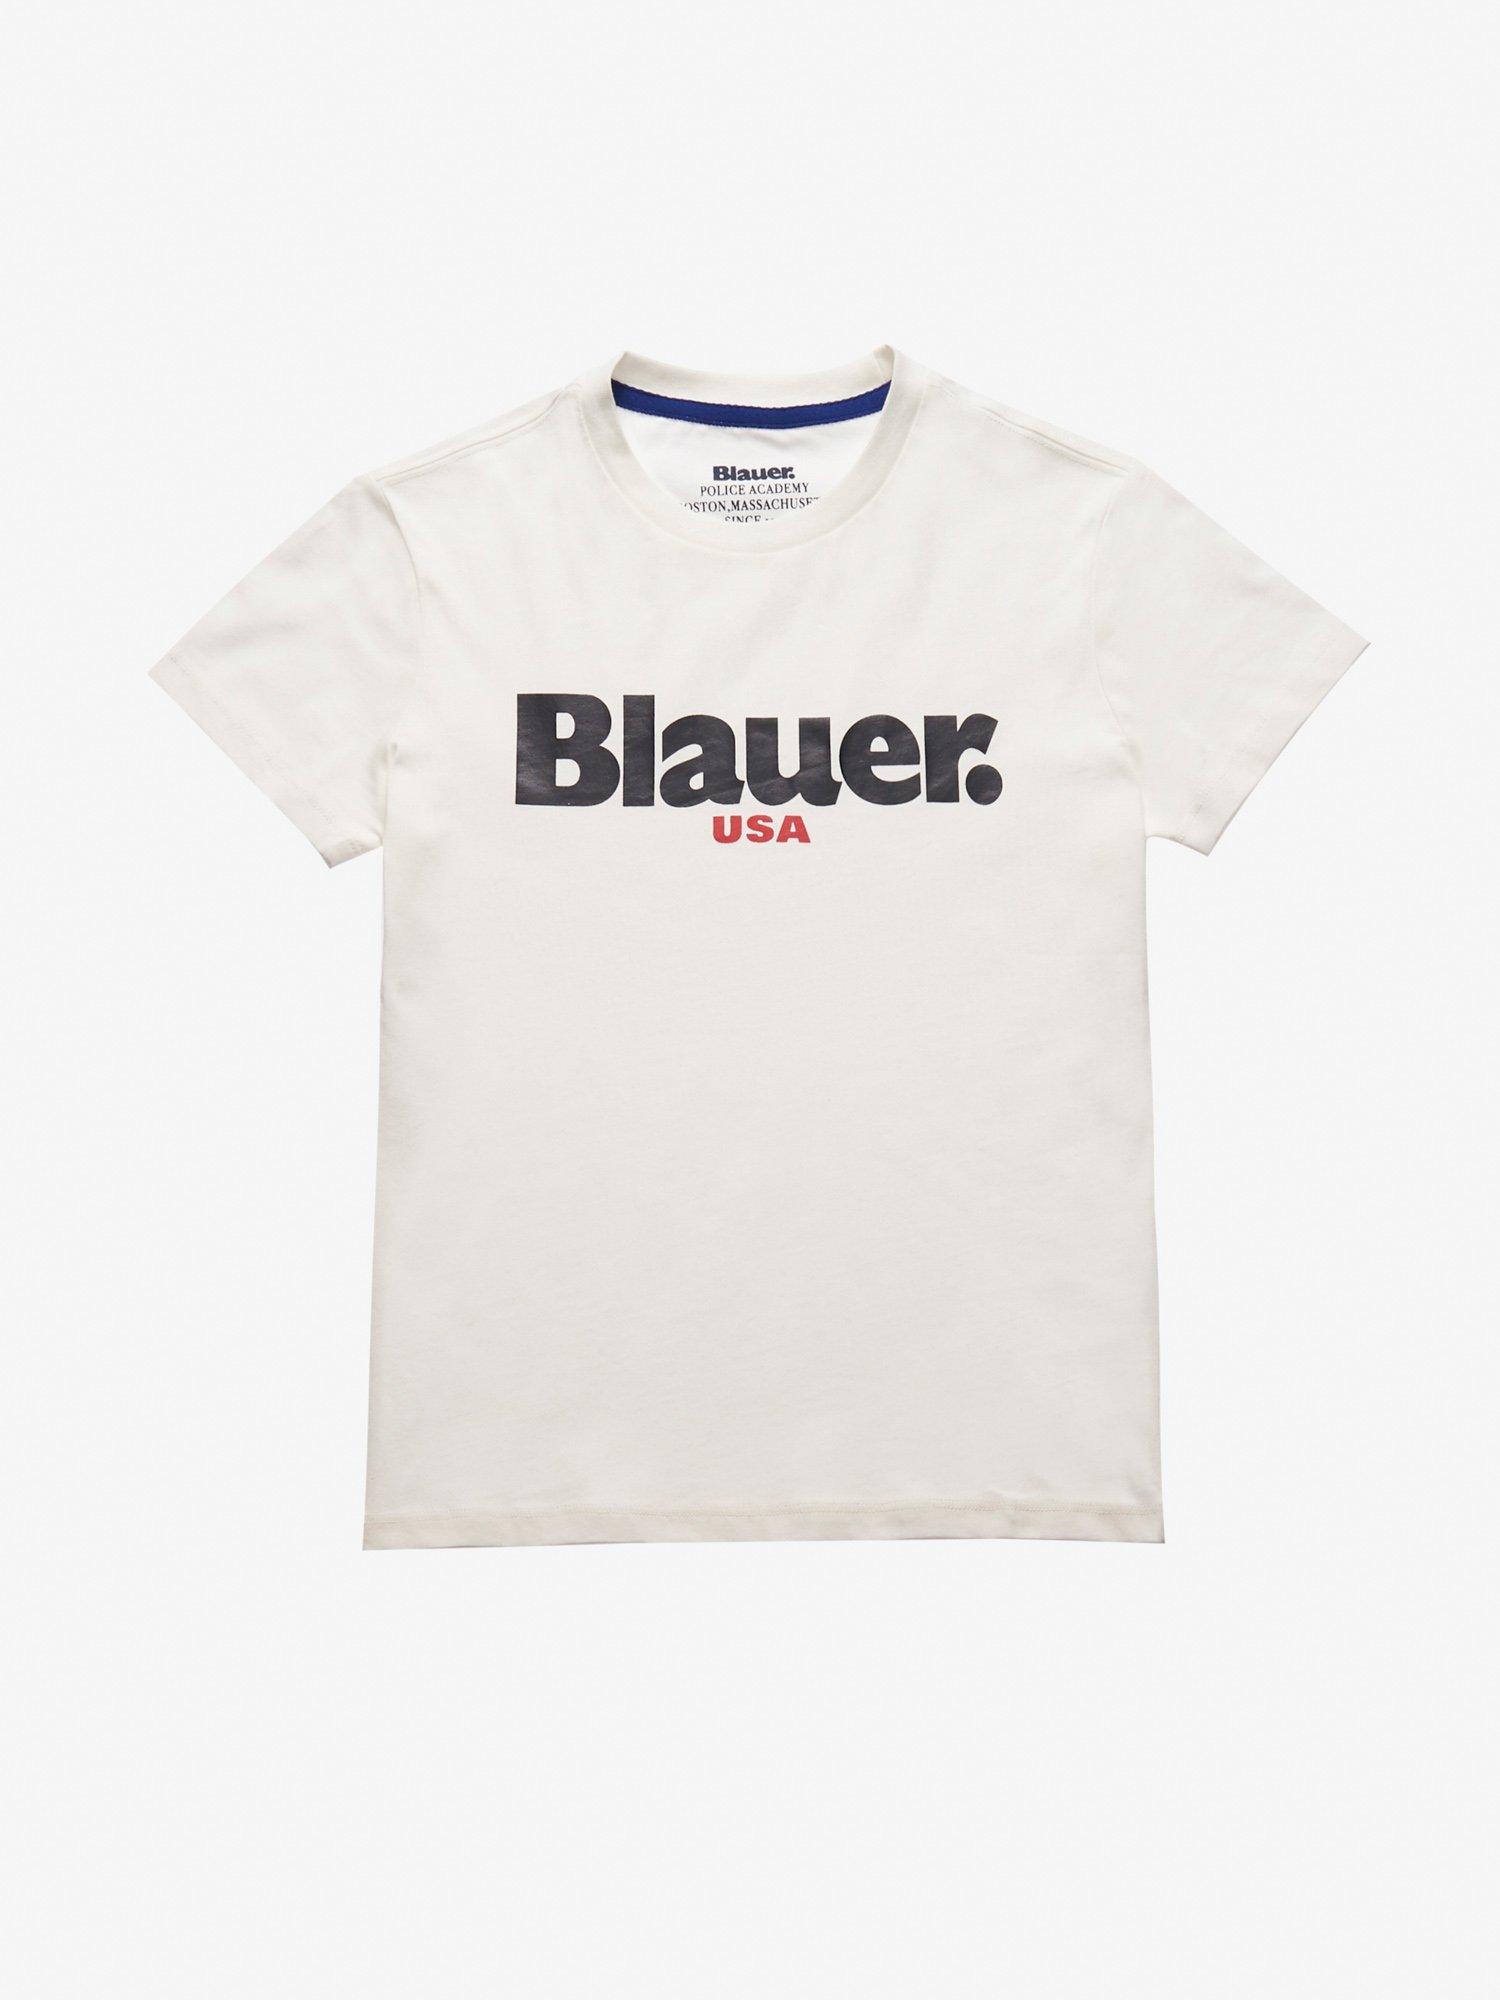 JUNIOR BLAUER USA T-SHIRT - Blauer